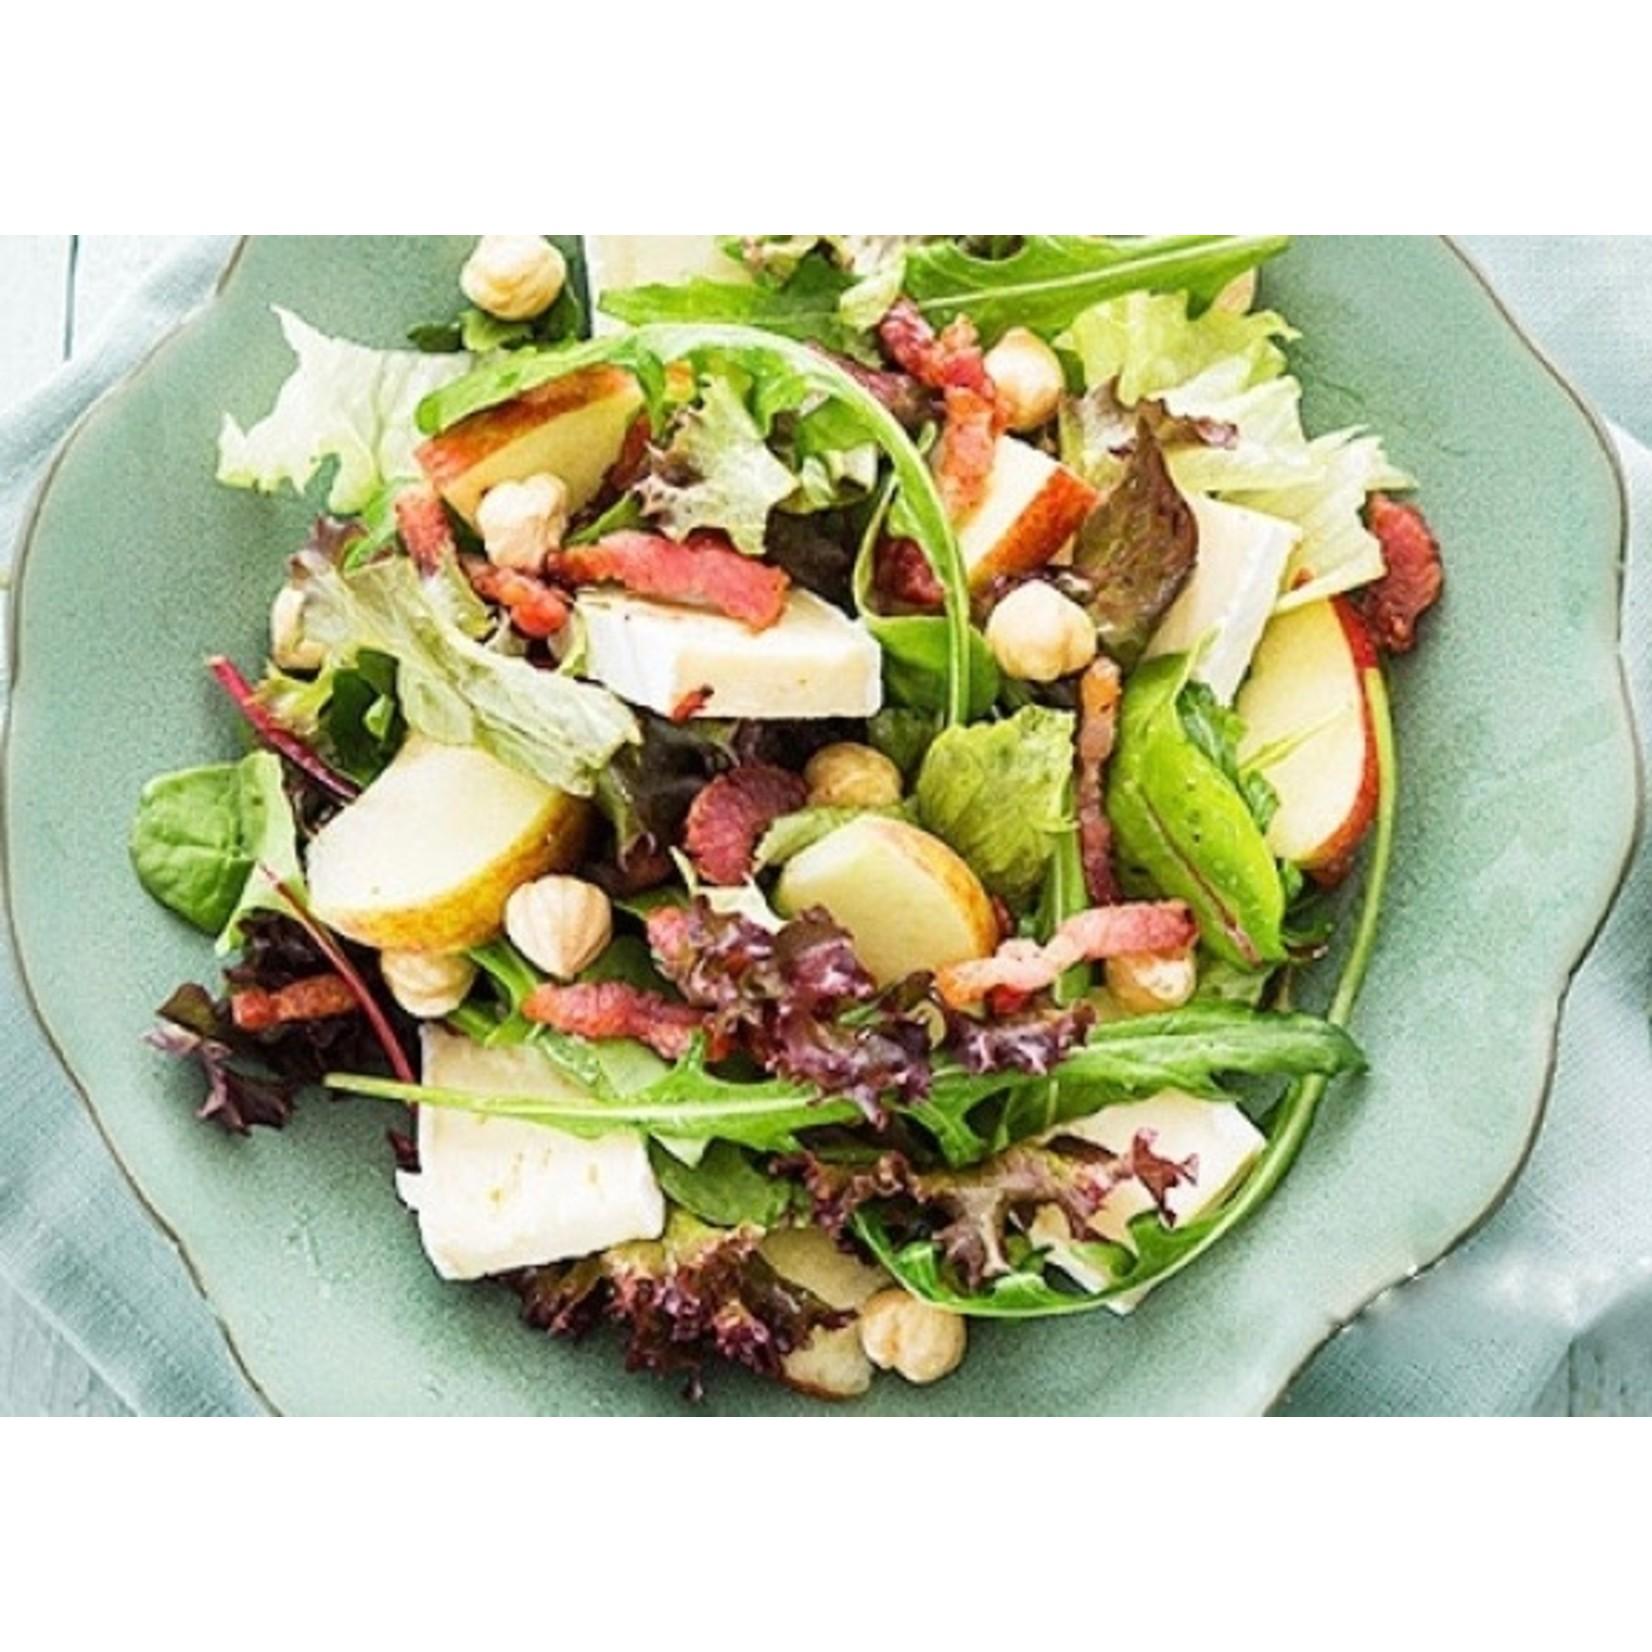 Salade met Spek & Appel